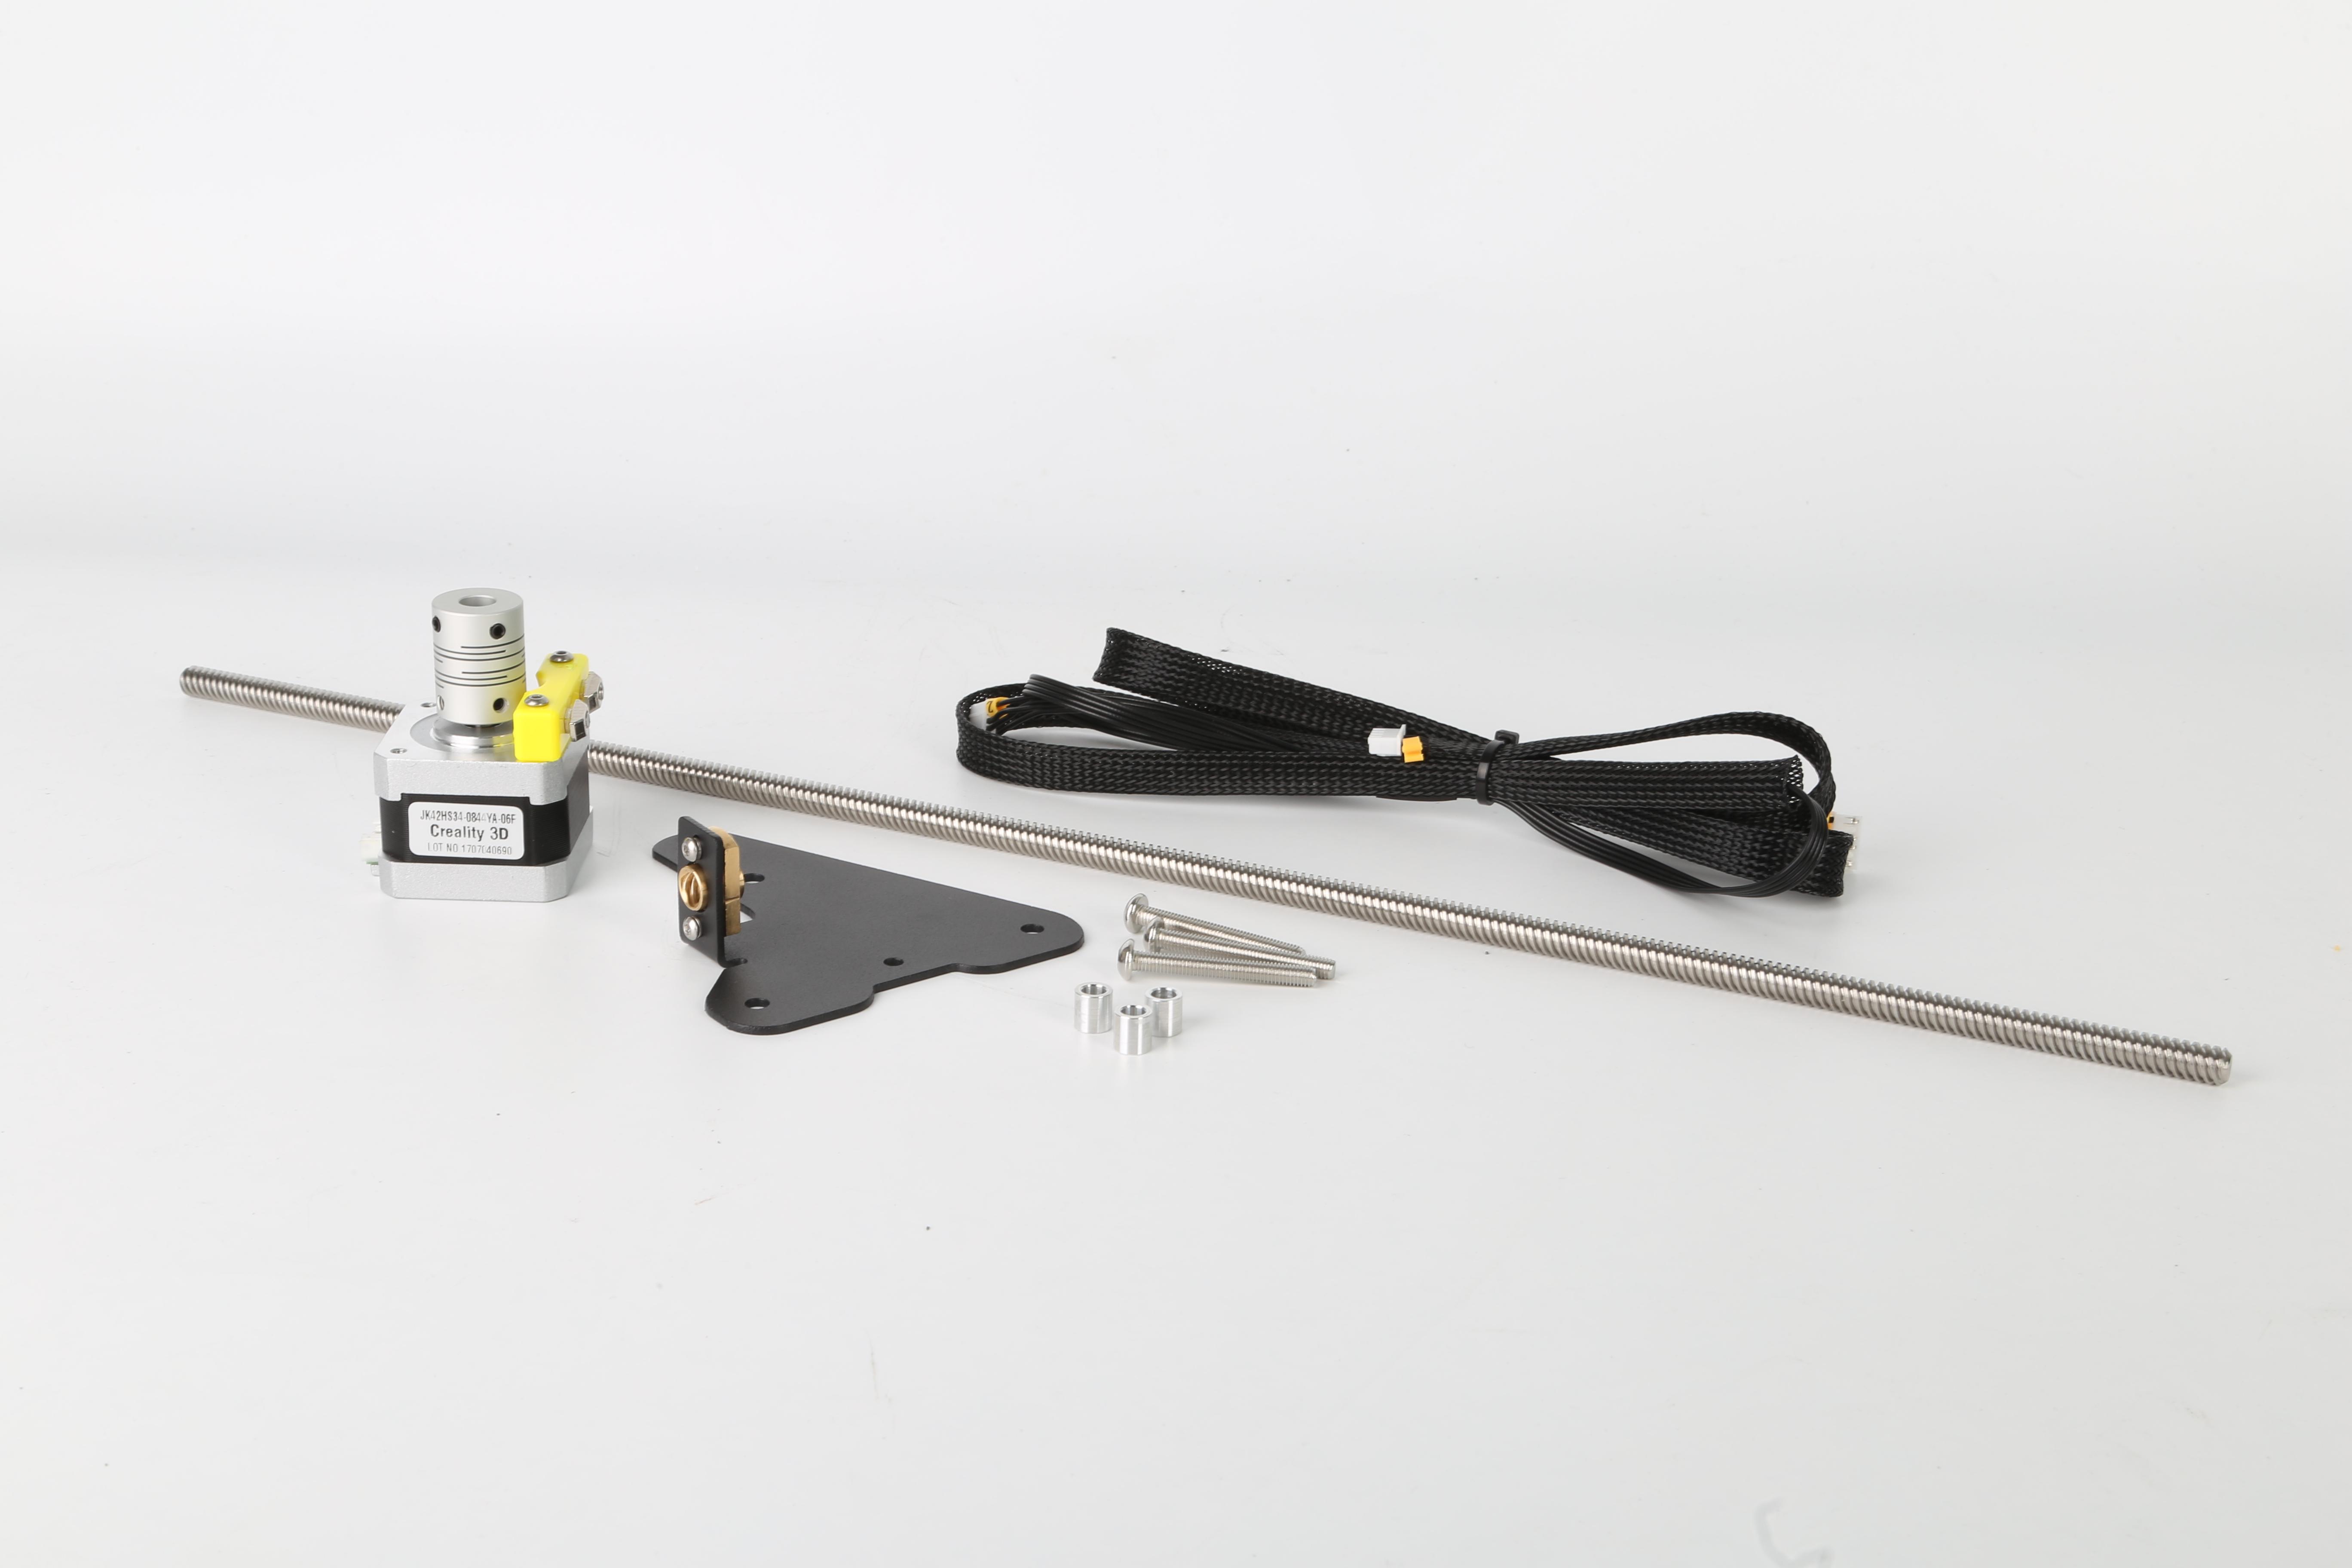 Creality 3D Ender-3 Dual Z-Achsen Upgrade Kit